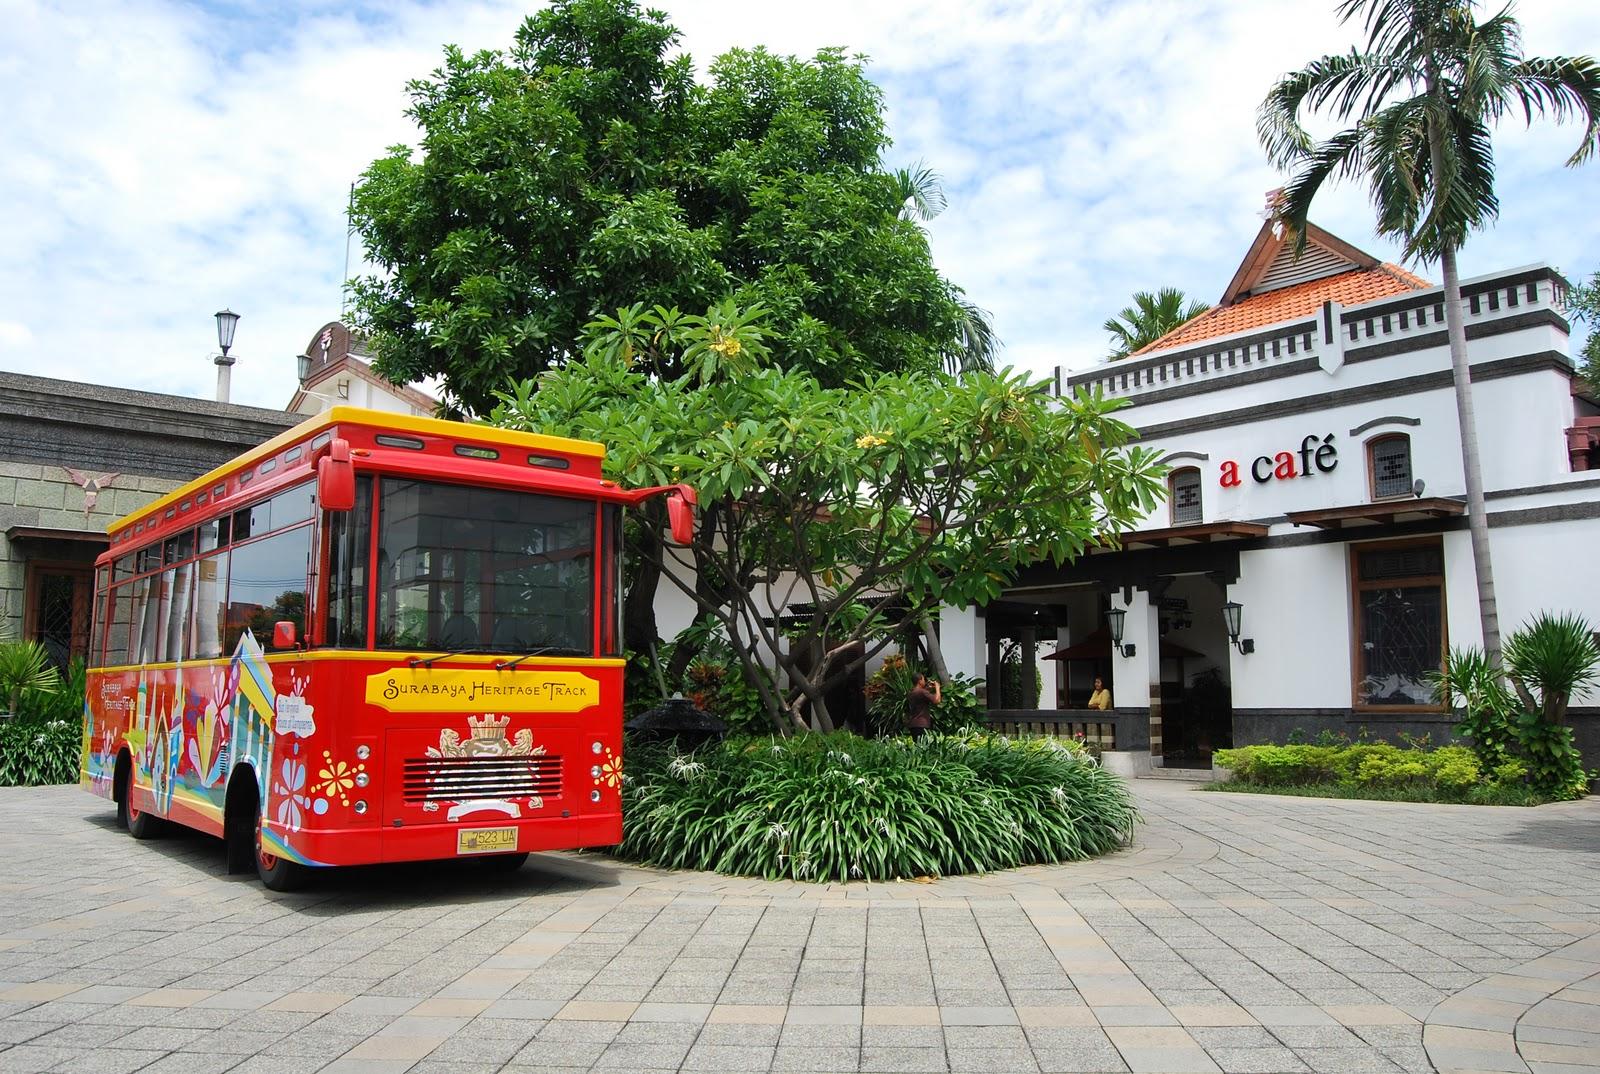 Dengan ikut Surabaya Heritage Track, wisatawan juga akan dapat pengetahuan baru tentang sejarah-sejarah di Surabaya